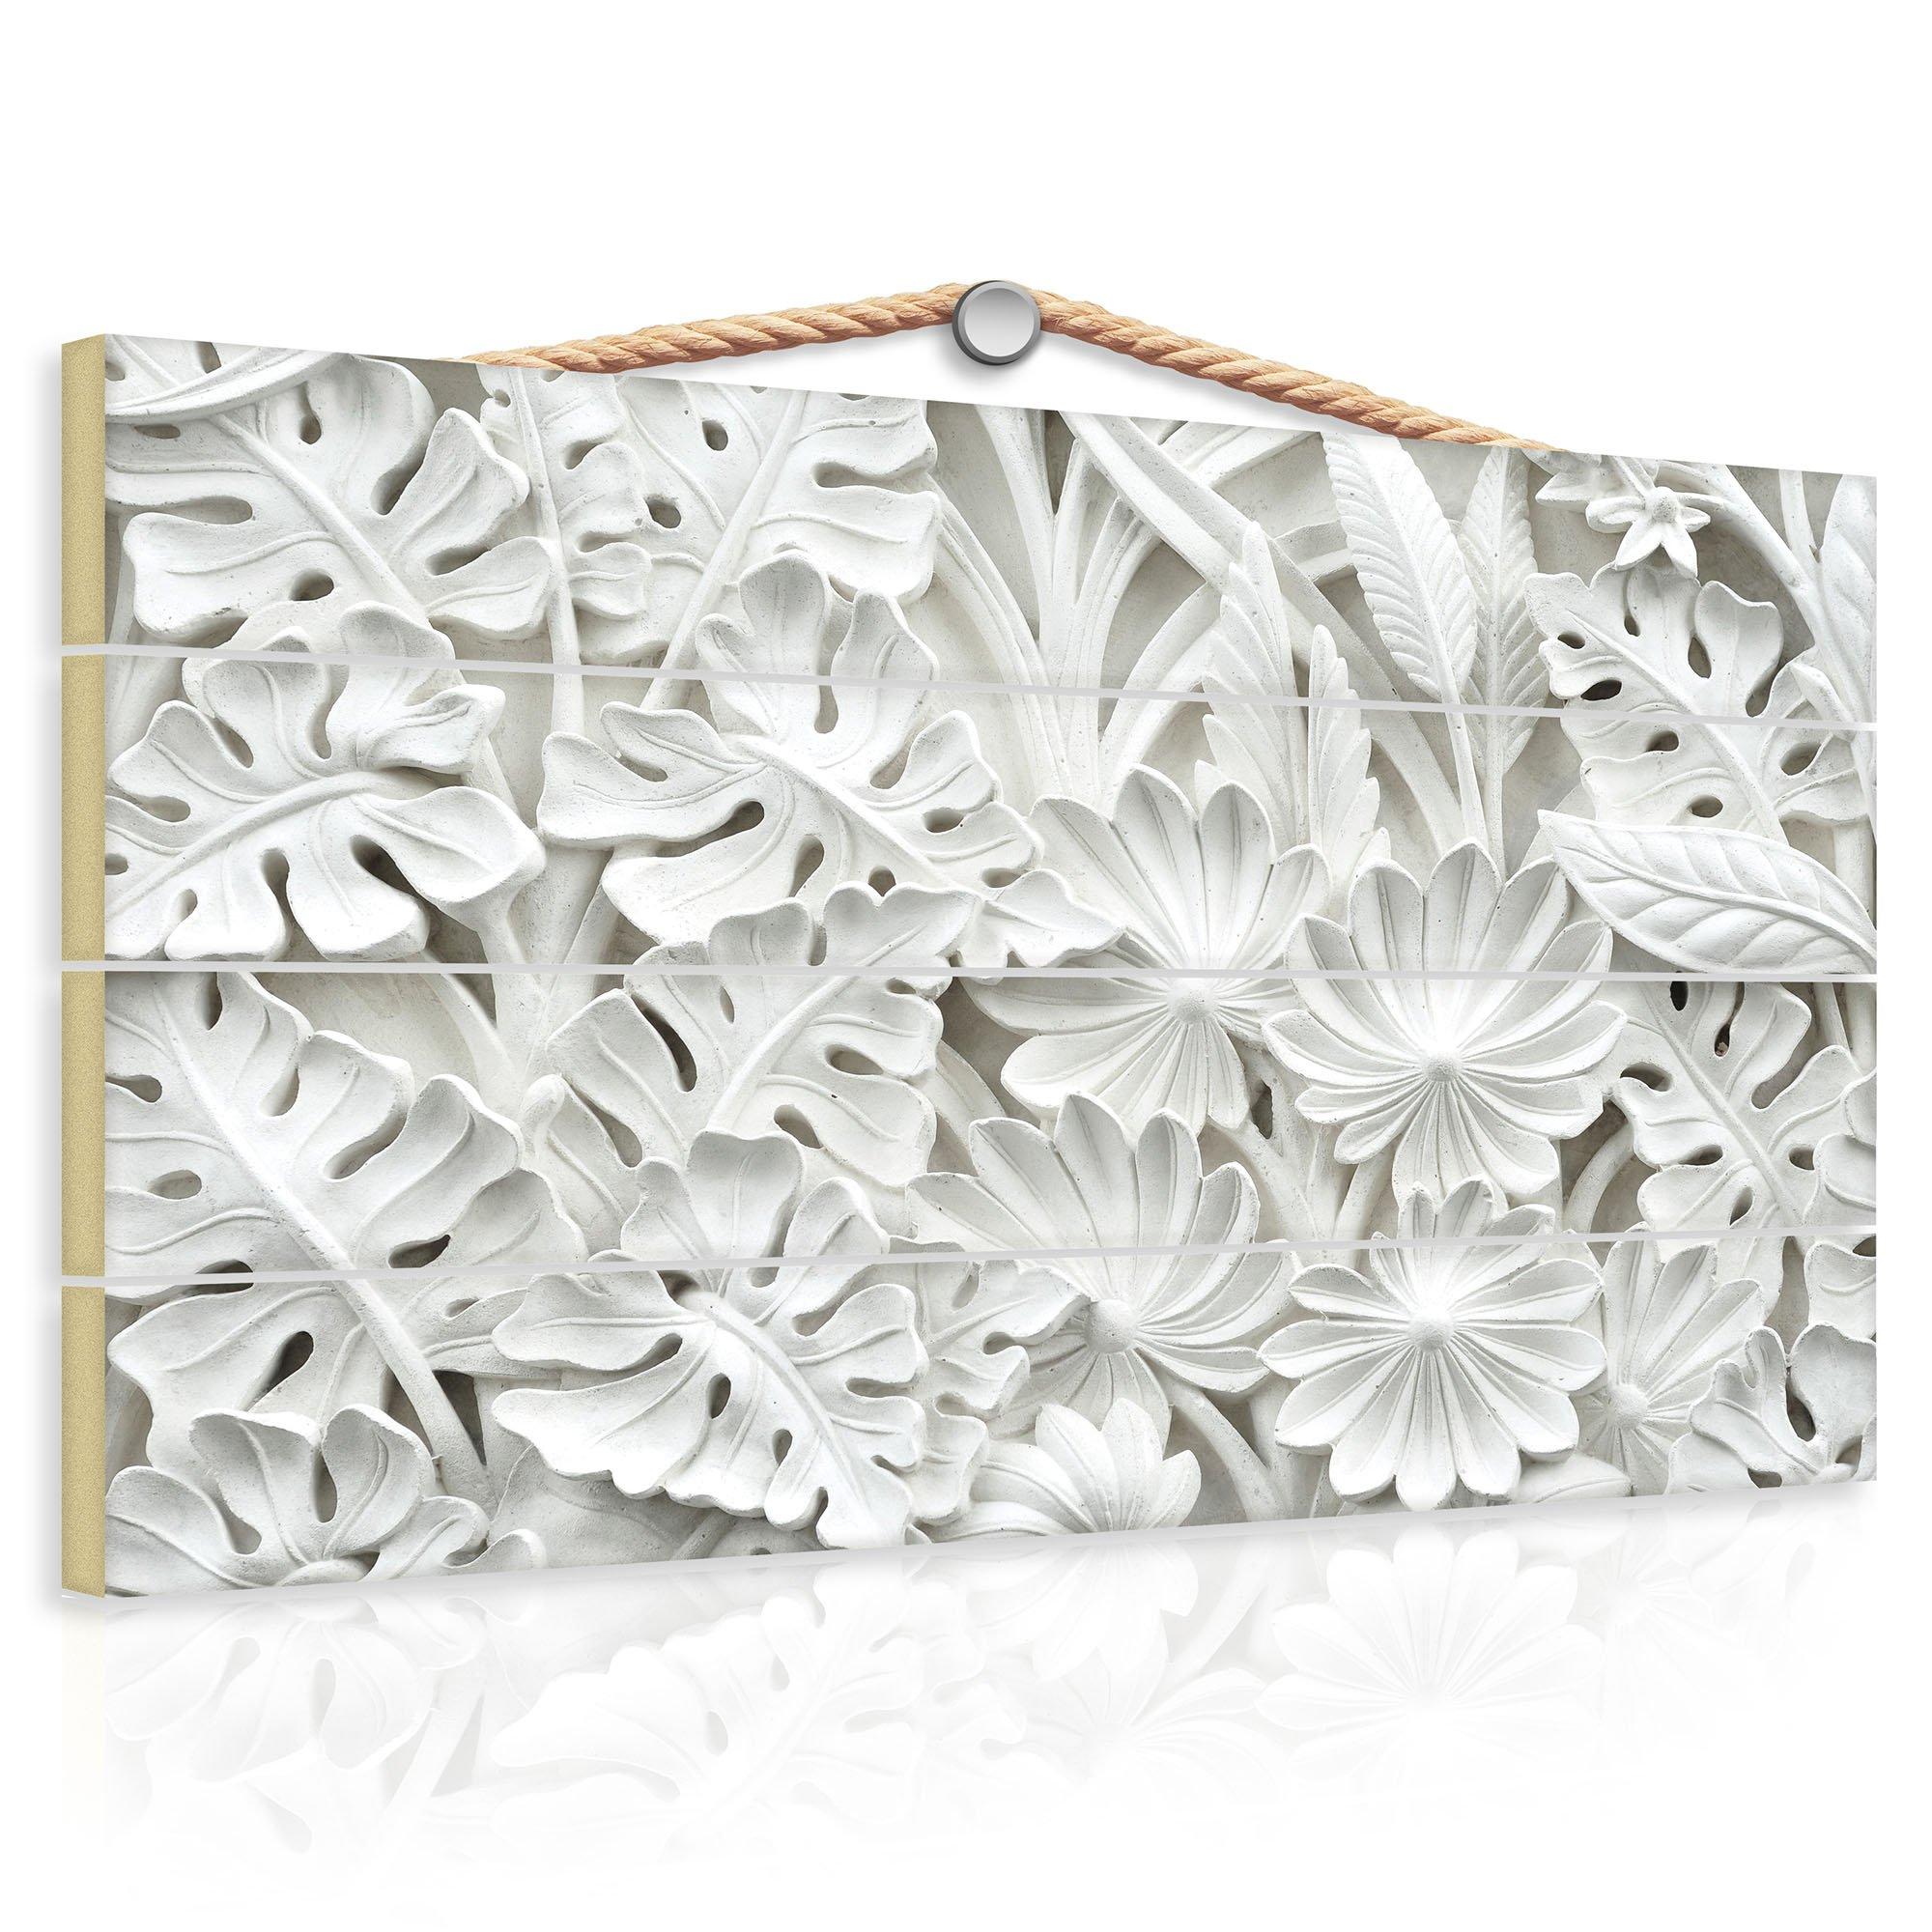 holzbild mit alabaster blumen relief weltderbilder. Black Bedroom Furniture Sets. Home Design Ideas